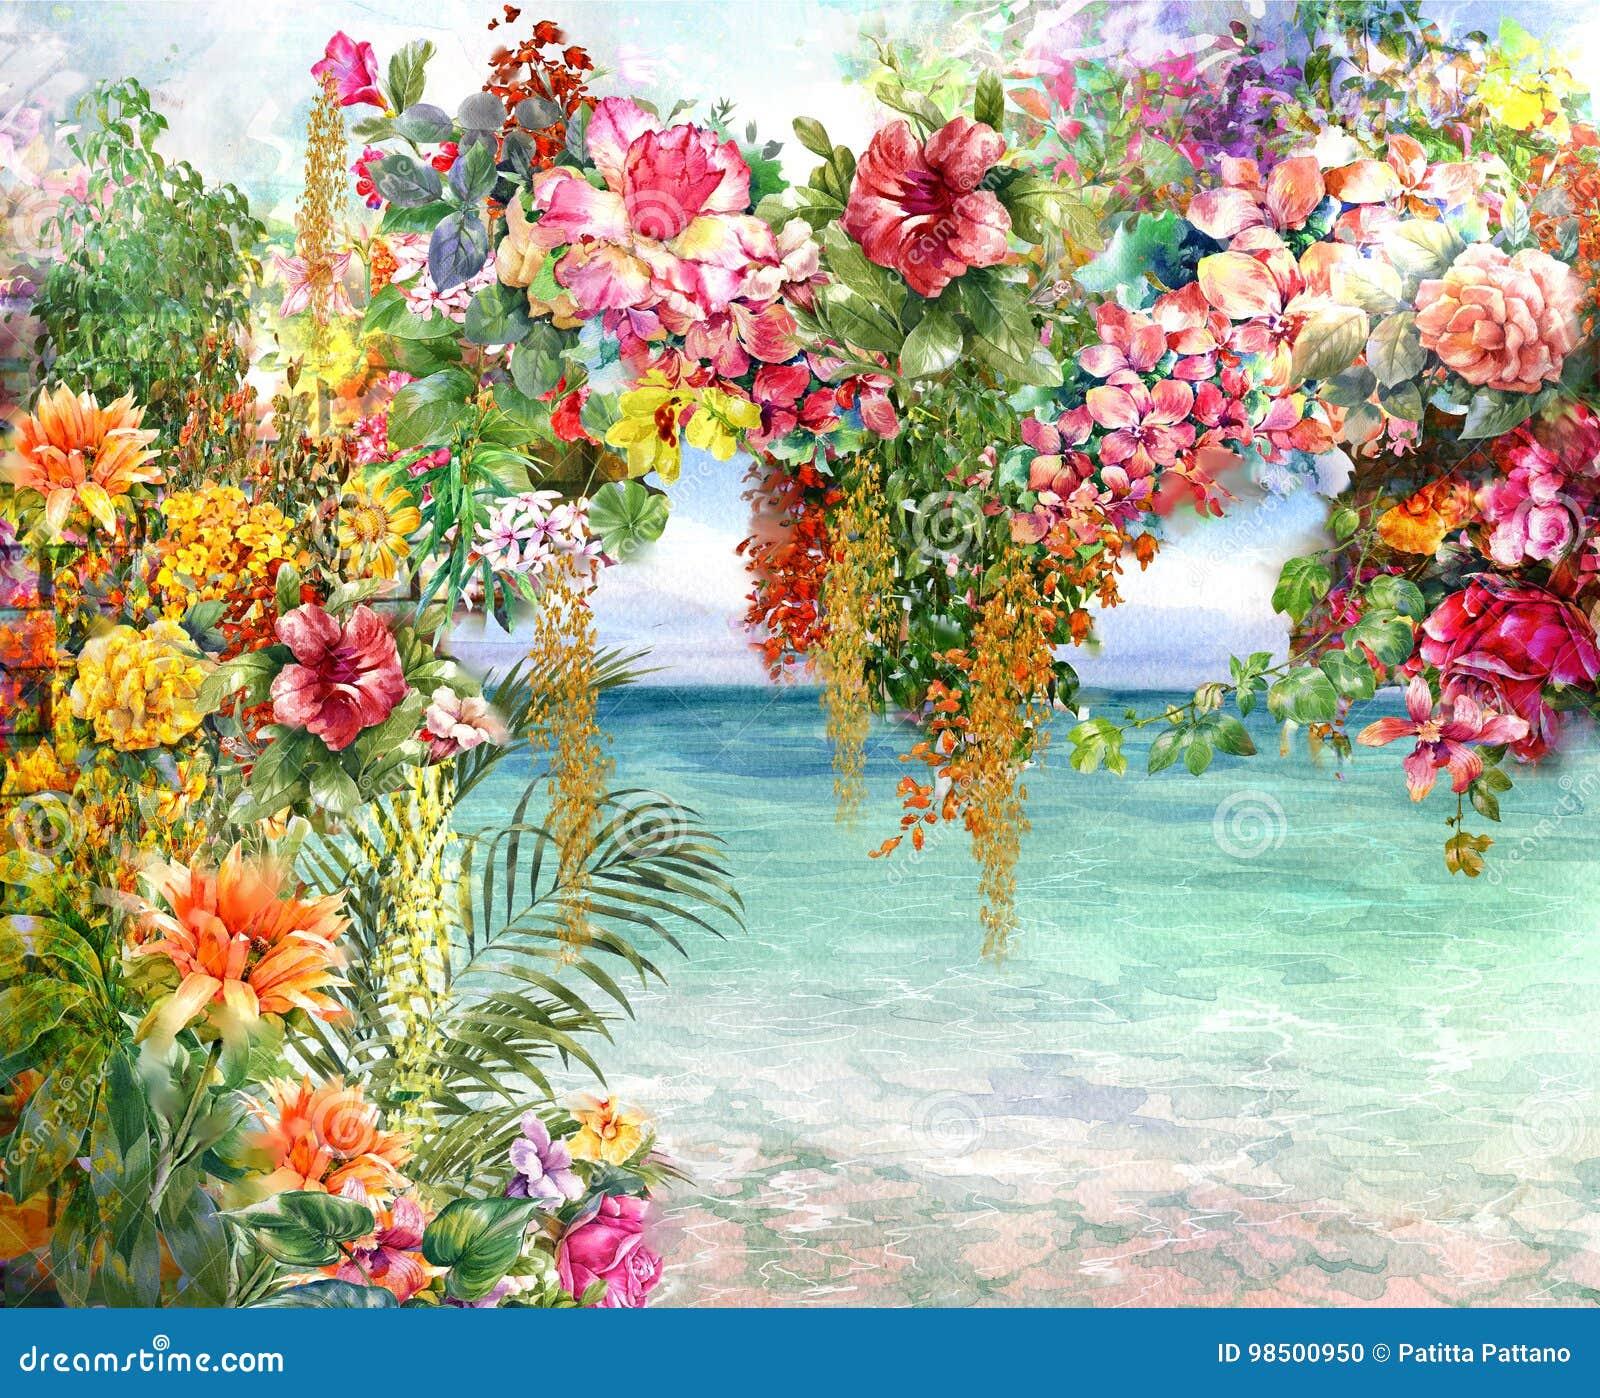 Zusammenfassung blüht Aquarellmalerei Frühling mehrfarbig nahe dem Meer